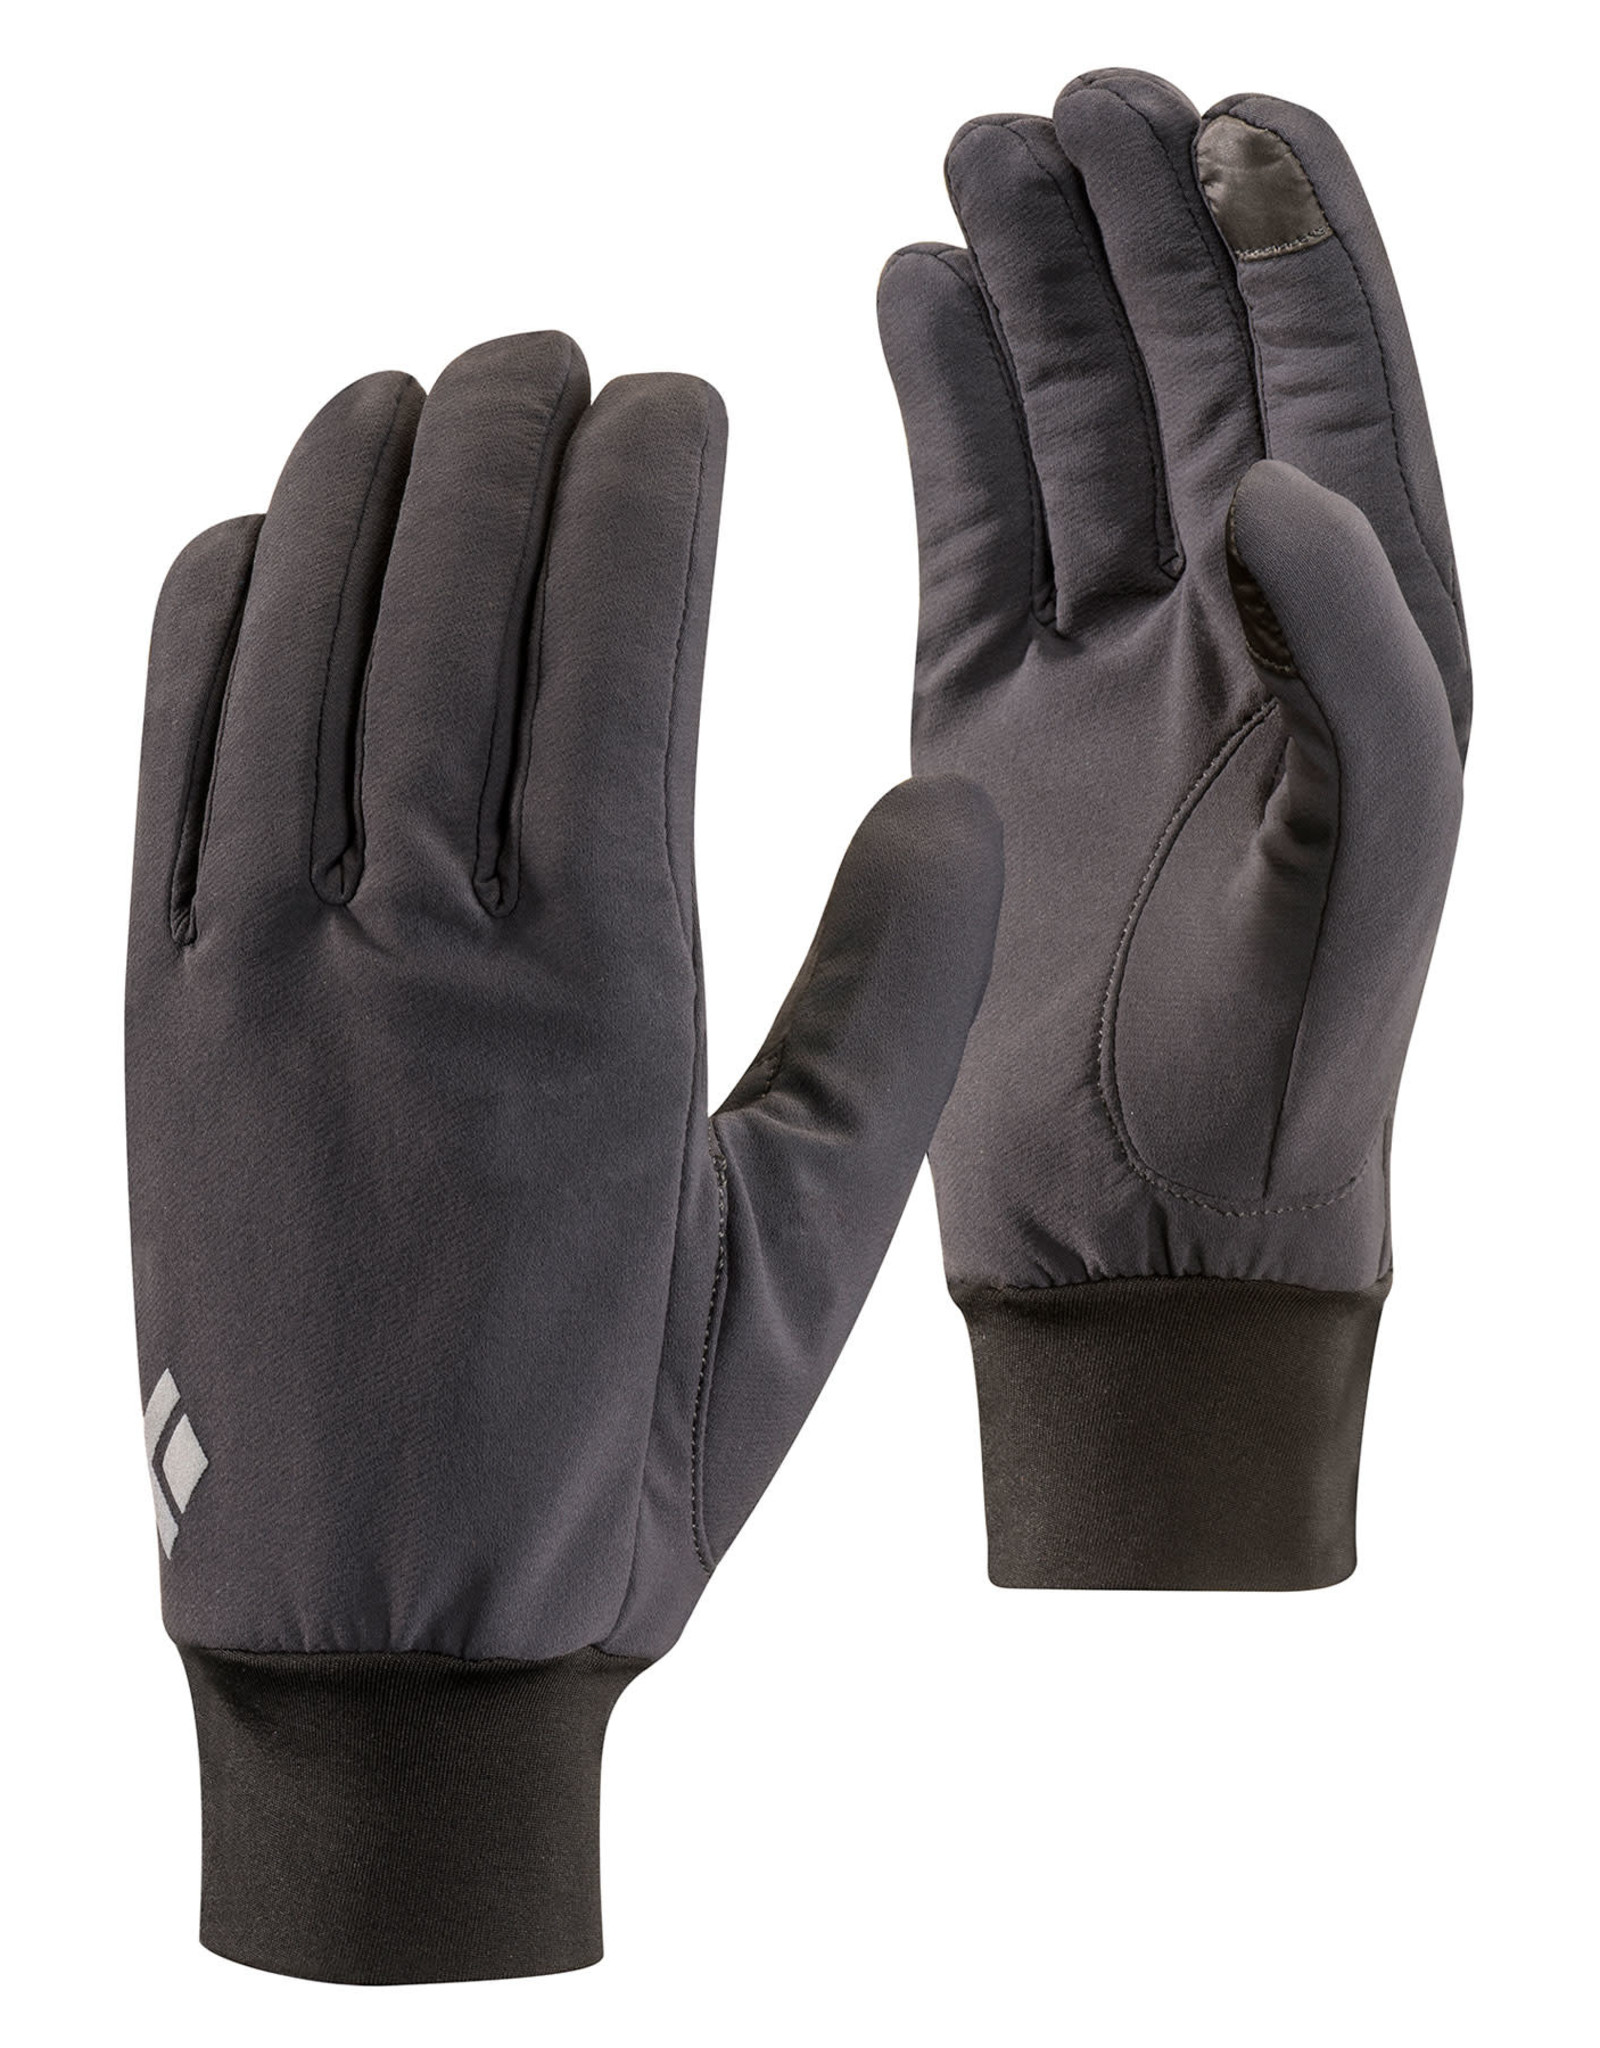 Black Diamond Black Diamond Lightweight Softshell Glove